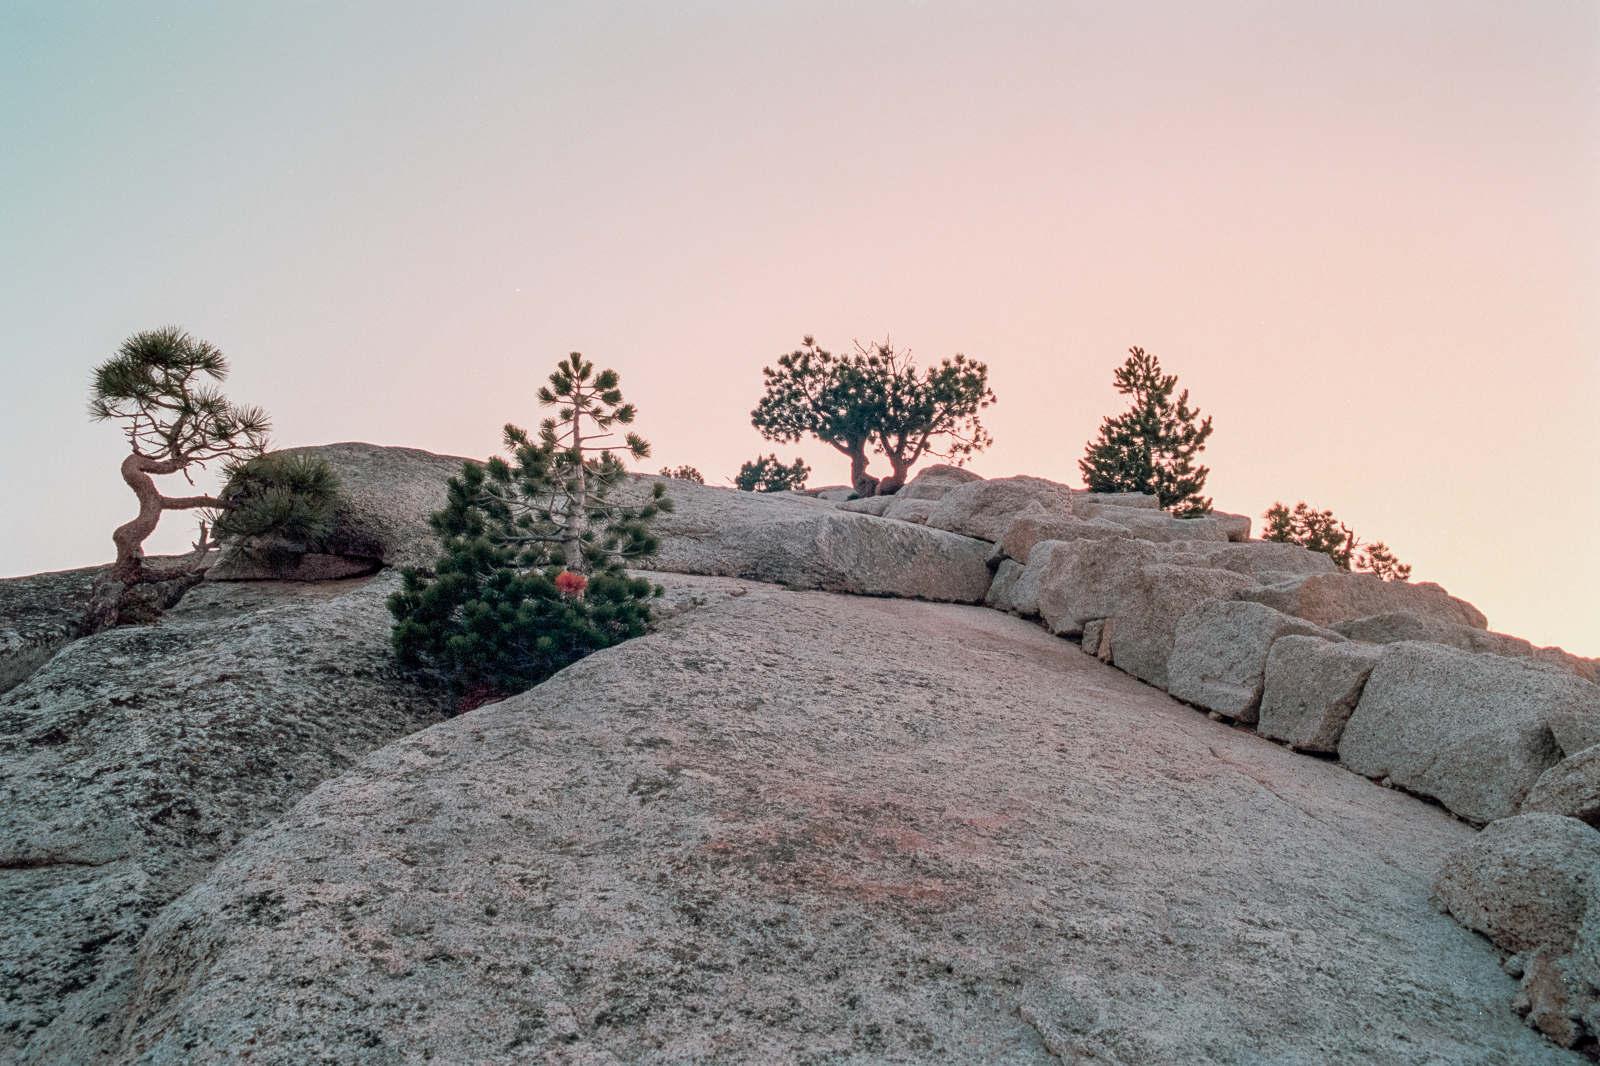 Photography_Cody_Cobb_Landscaps_02